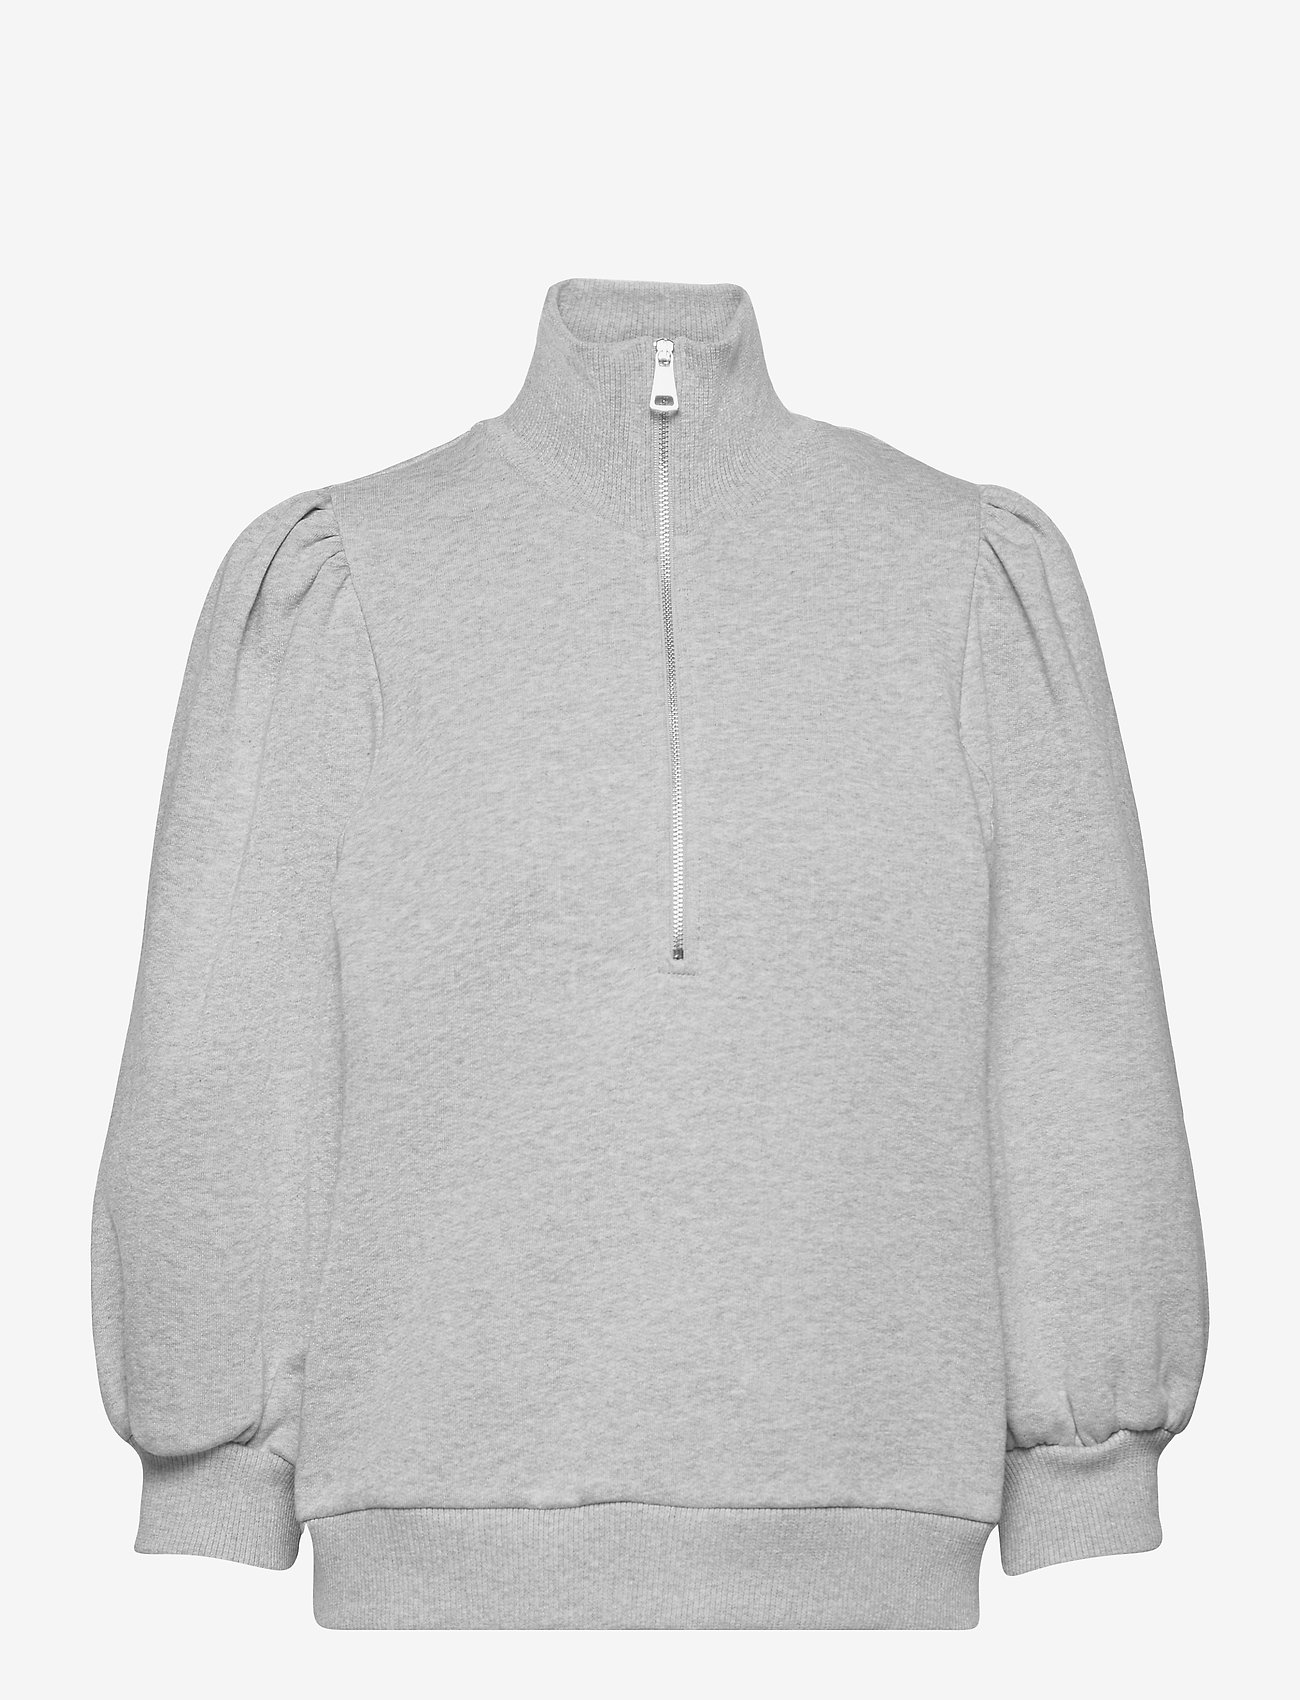 Gestuz - NankitaGZ ss zipper sweatshirt - sweatshirts & hoodies - light grey melange - 1